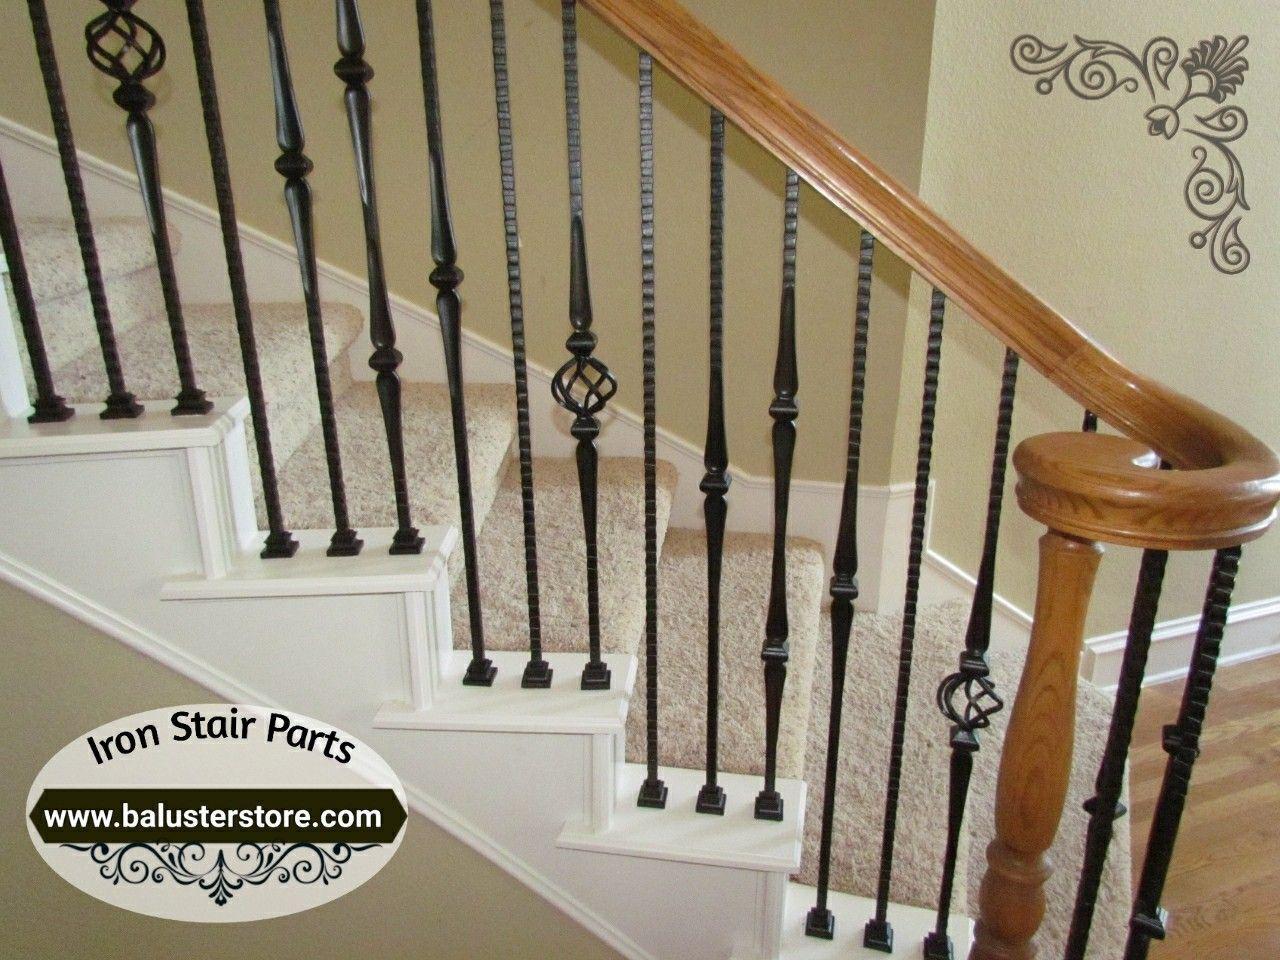 Merveilleux Cheap Iron Stair Parts